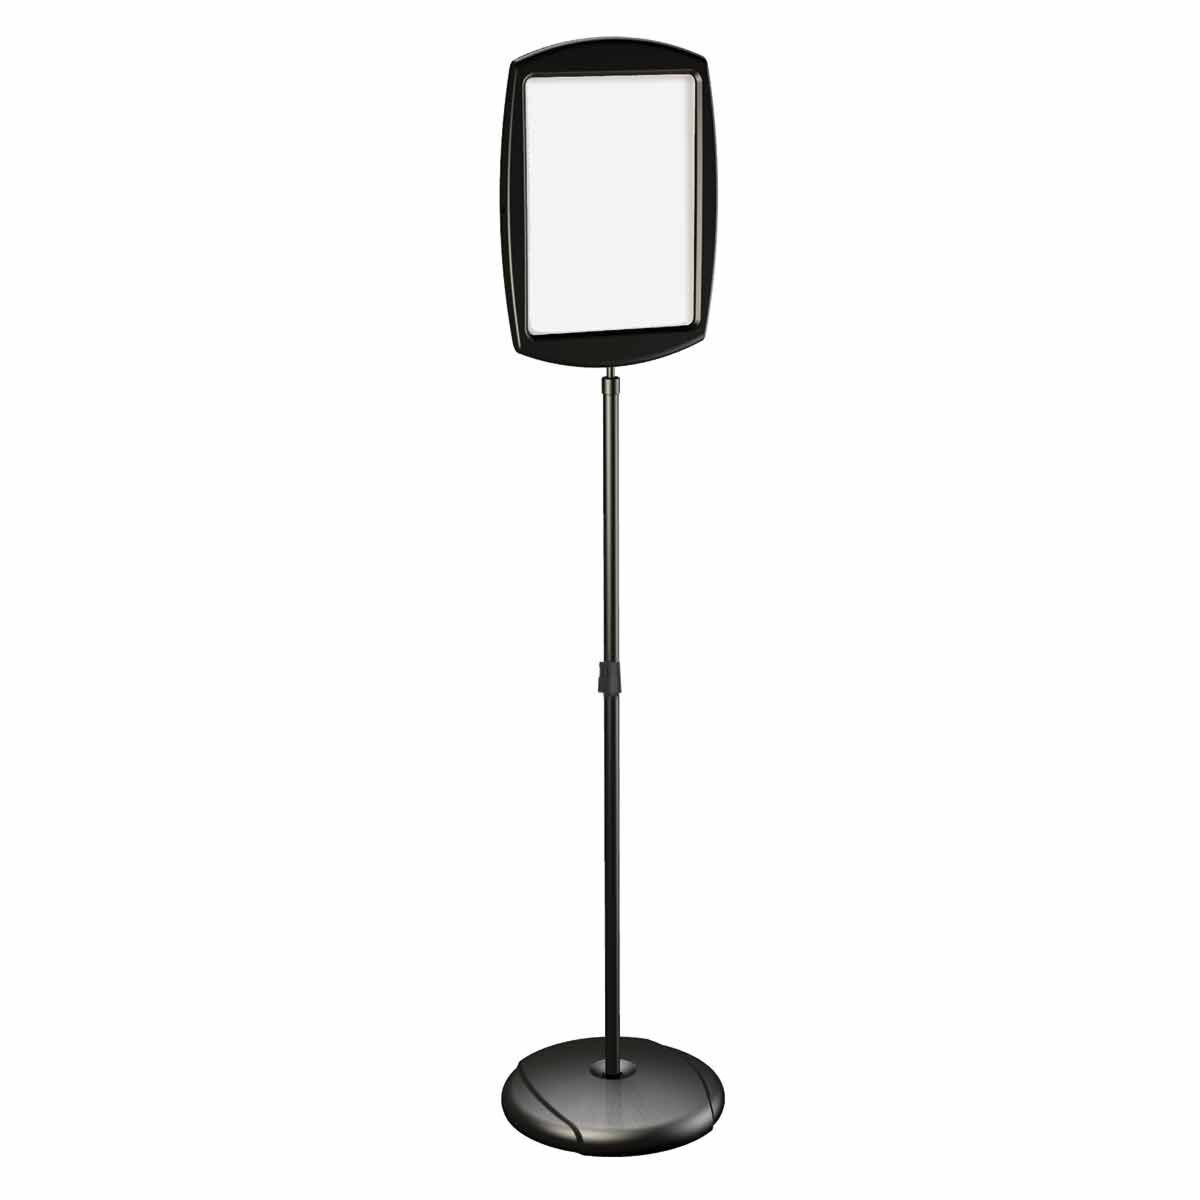 Bi-office Magnetic Drywipe Vertical Rectangle Floor Sign